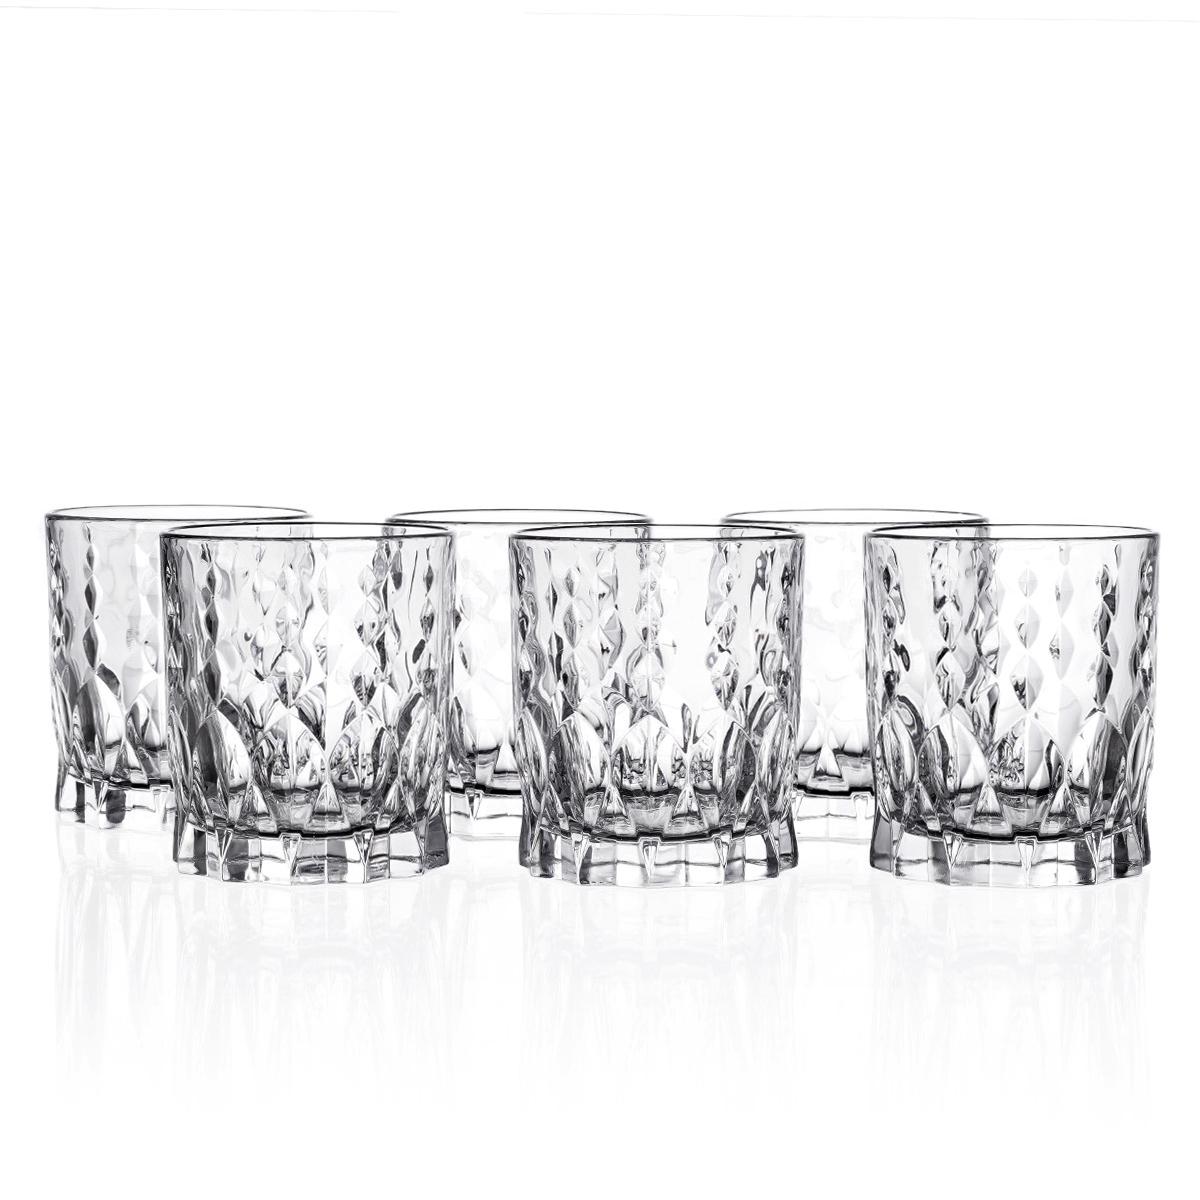 Фото - Набор стаканов для виски RCR Marilyn 340 мл (6 шт) набор стаканов для виски pure 389 мл